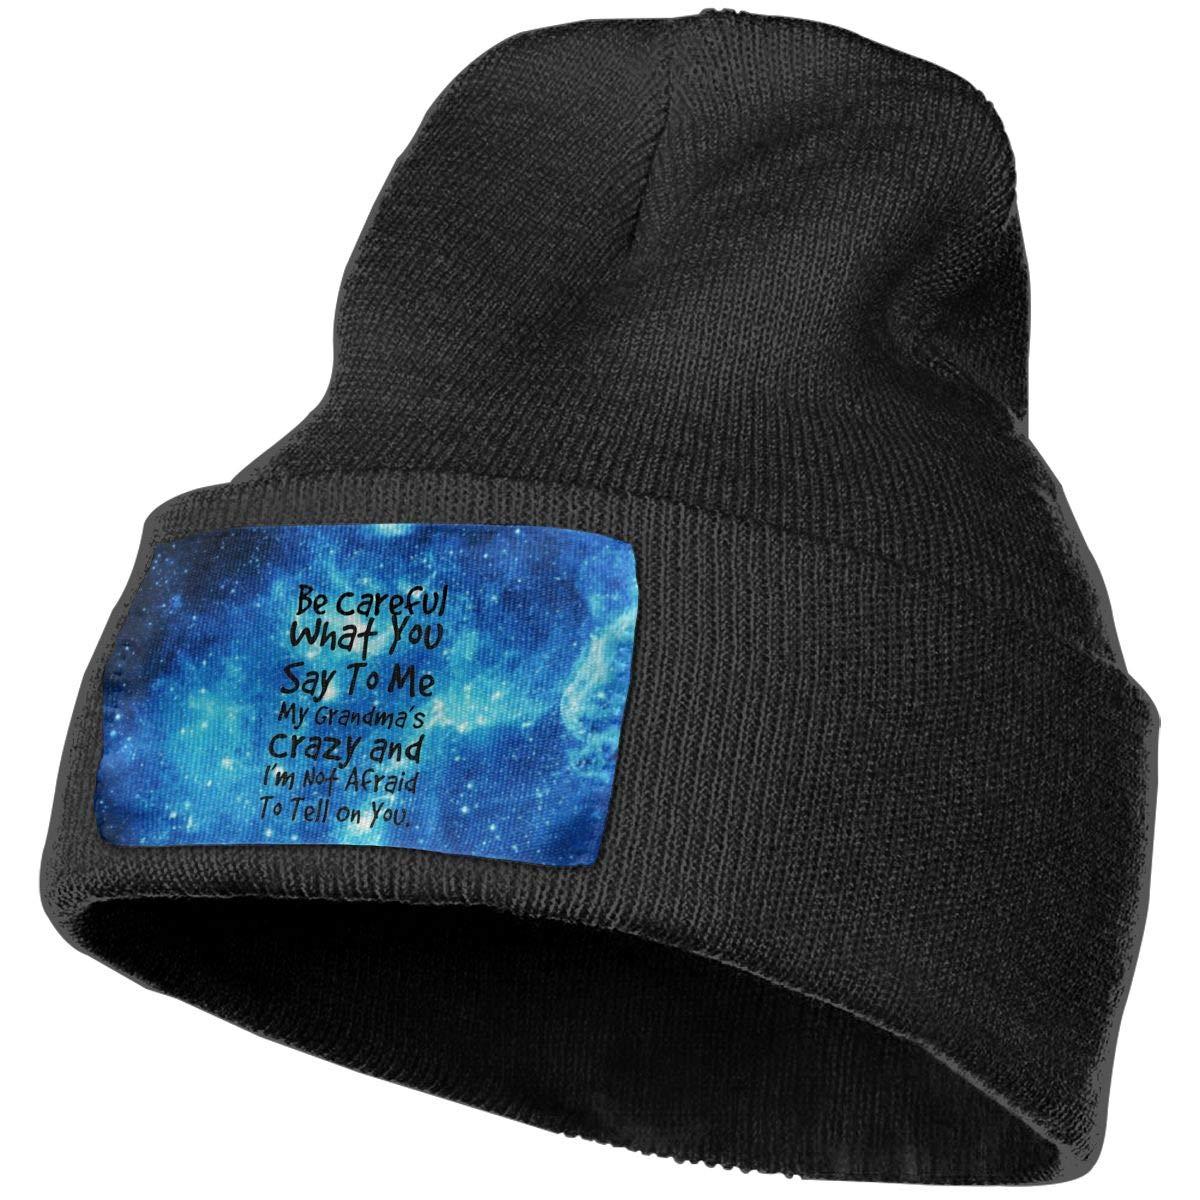 Helidoud My Grandmas Crazy Winter Beanie Hat Knit Skull Cap for for Men /& Women